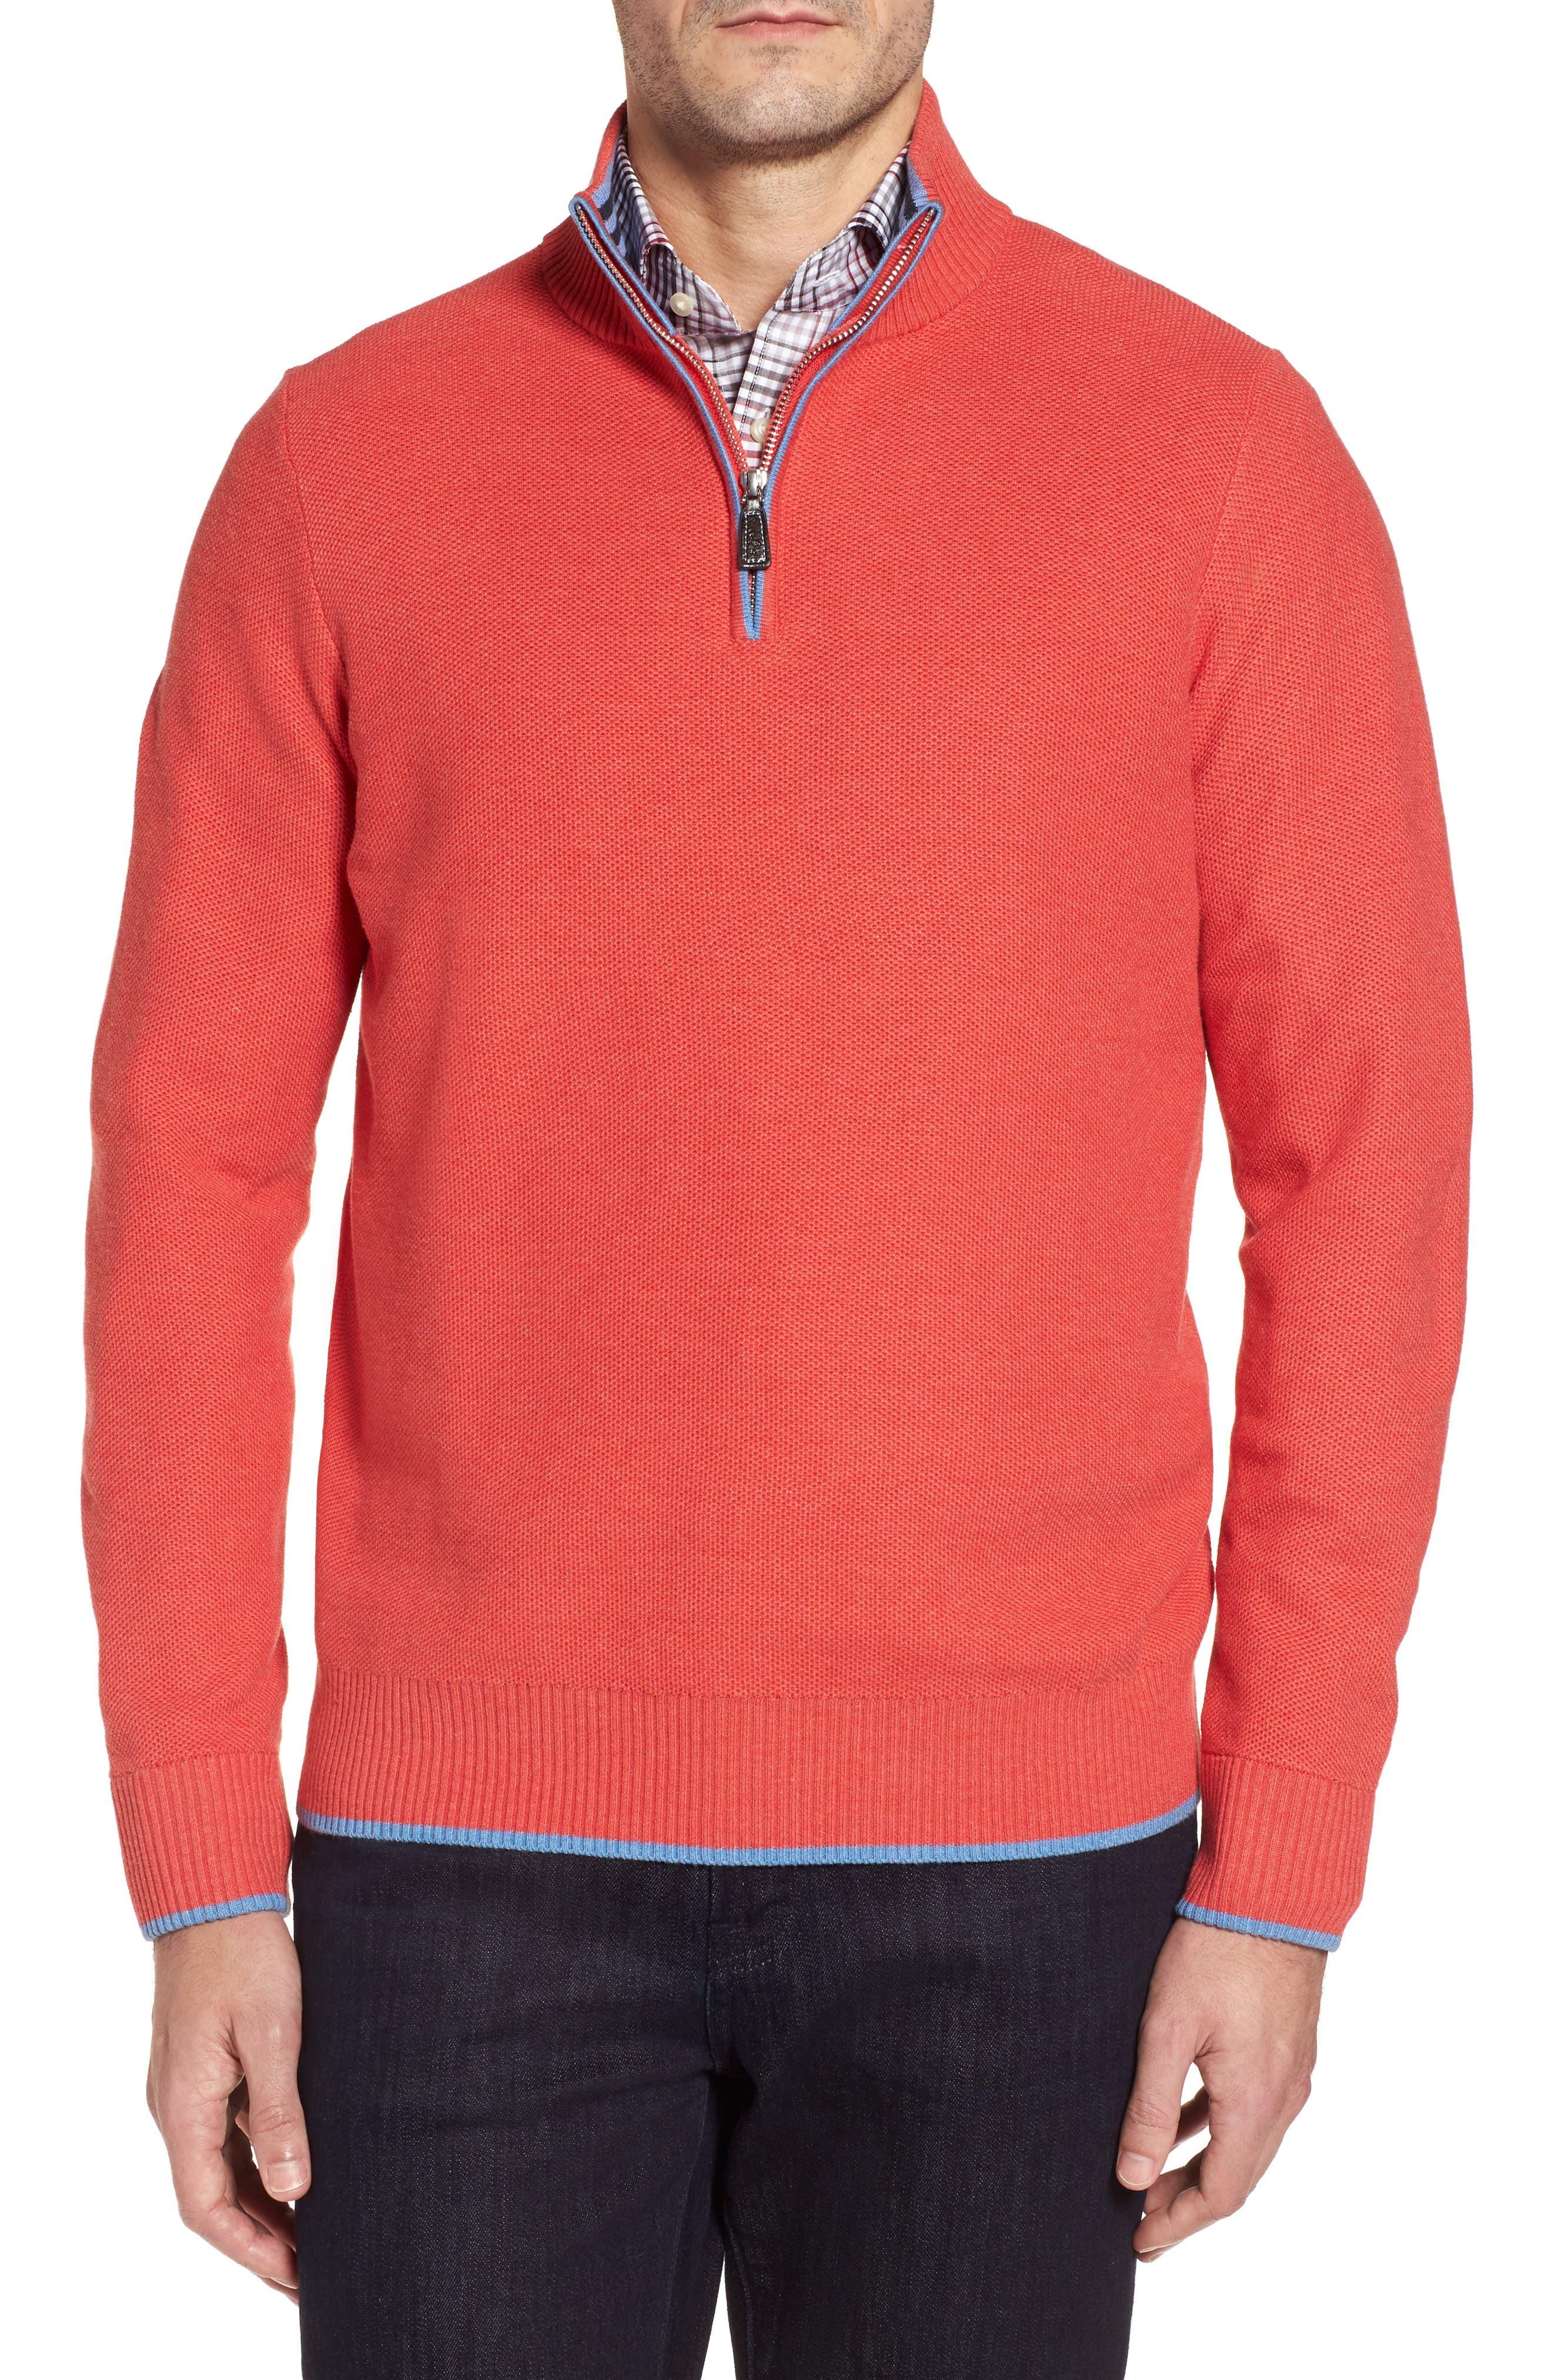 Main Image - TailorByrd Sorrel Tipped Quarter Zip Sweater